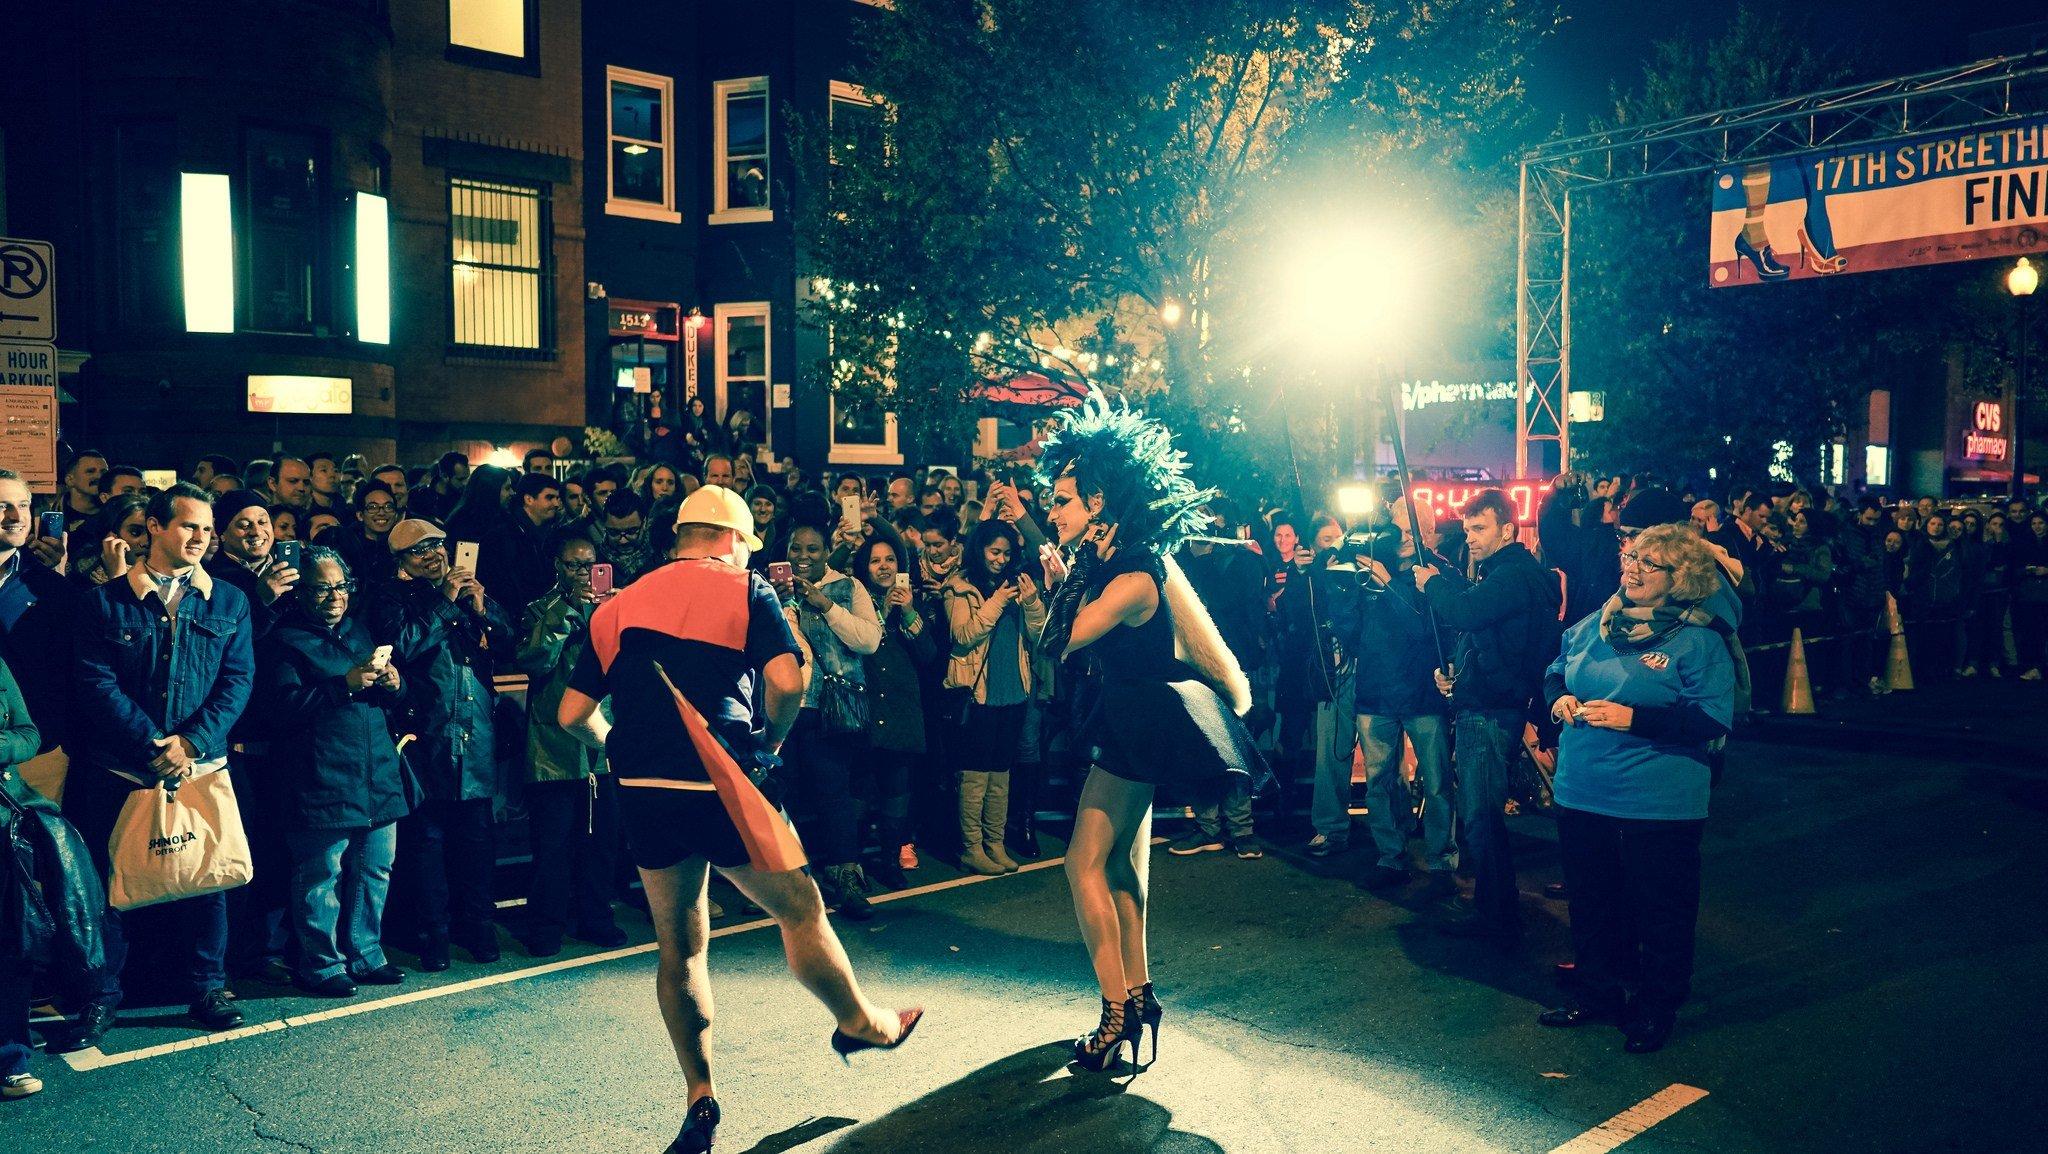 washington dc nighttime drag show